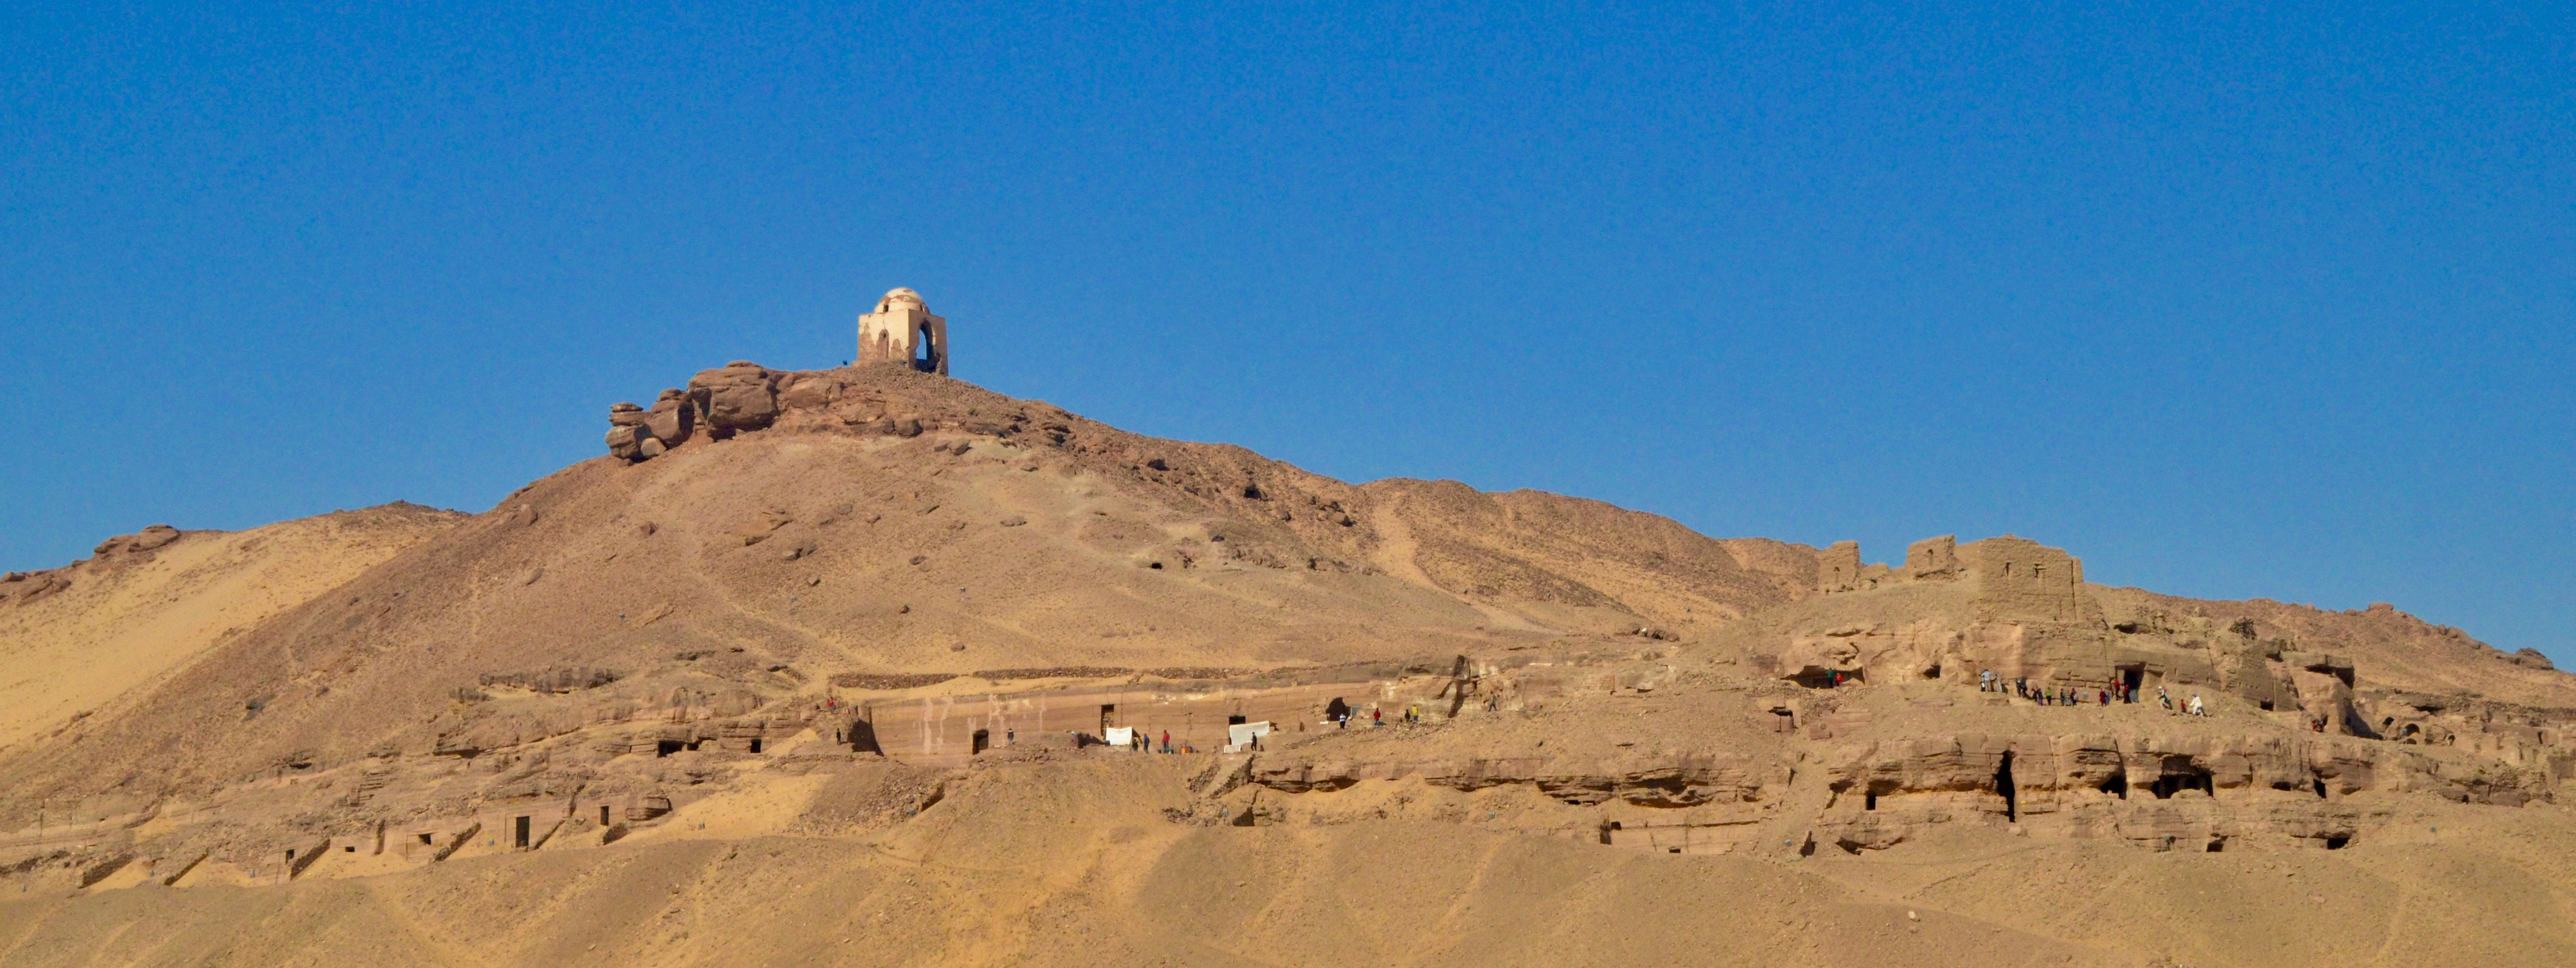 Shia Mausoleum & Pharaonic Tombs, Aswan